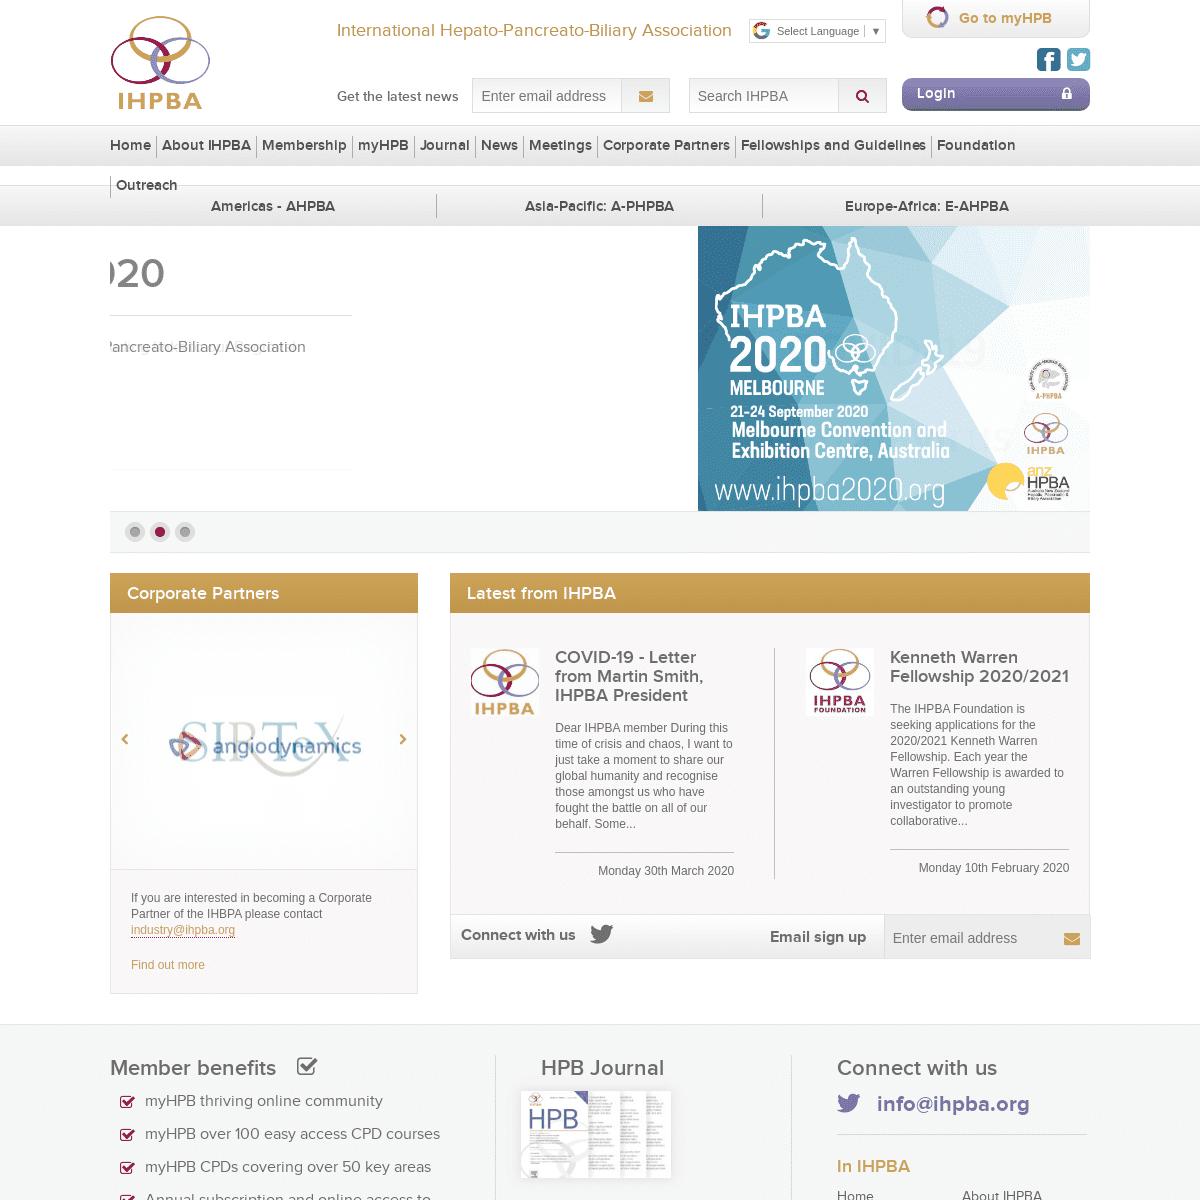 International Hepato-Pancreato Biliary Association - IHPBA